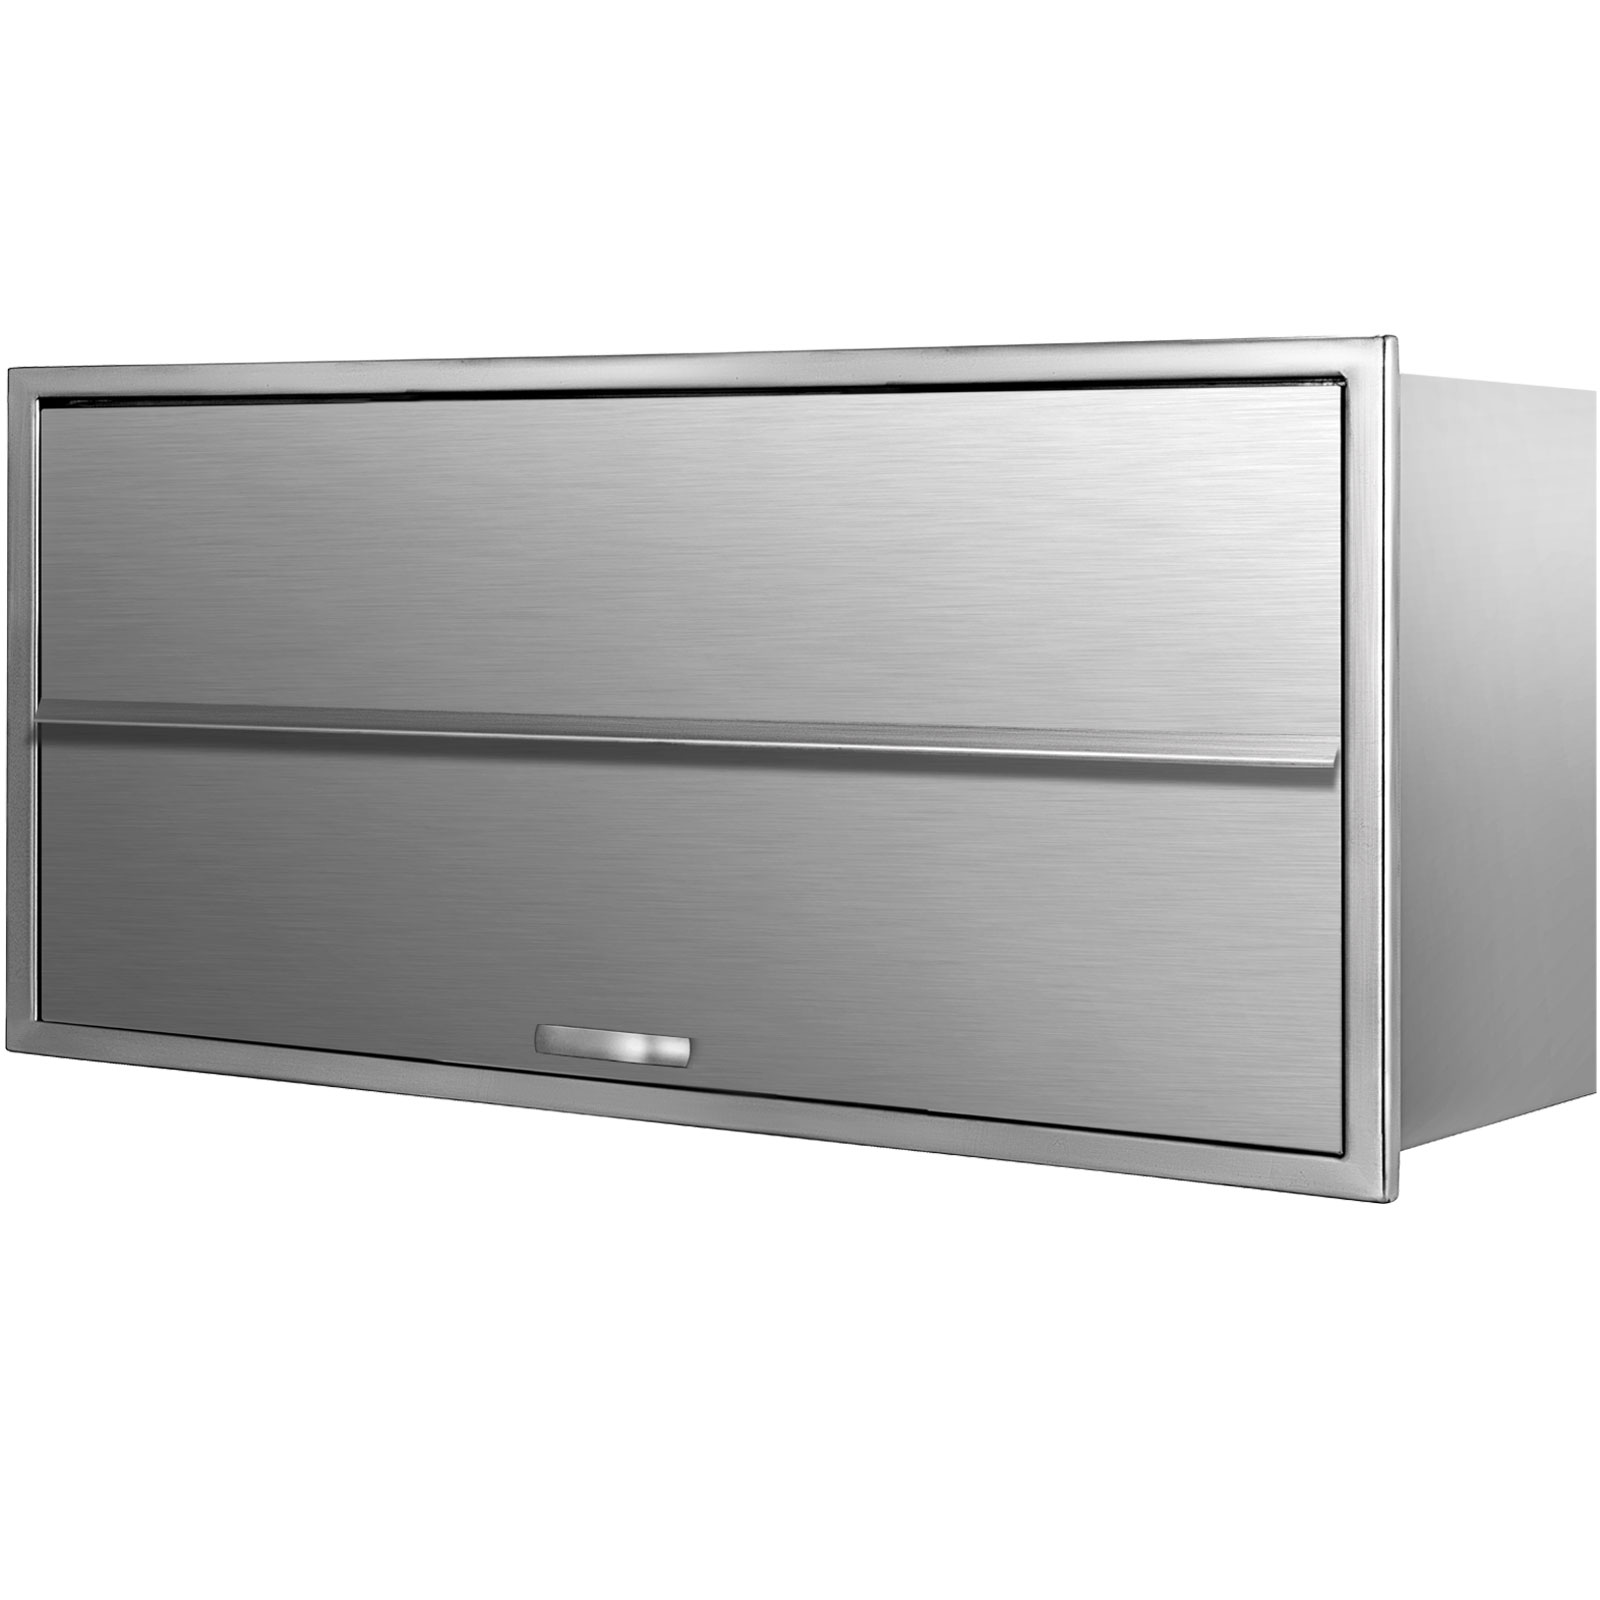 17 Type Drop In Ice Chest Bin Boxes W Cover Stainless Steel Outdoor Indoor 304 Ebay